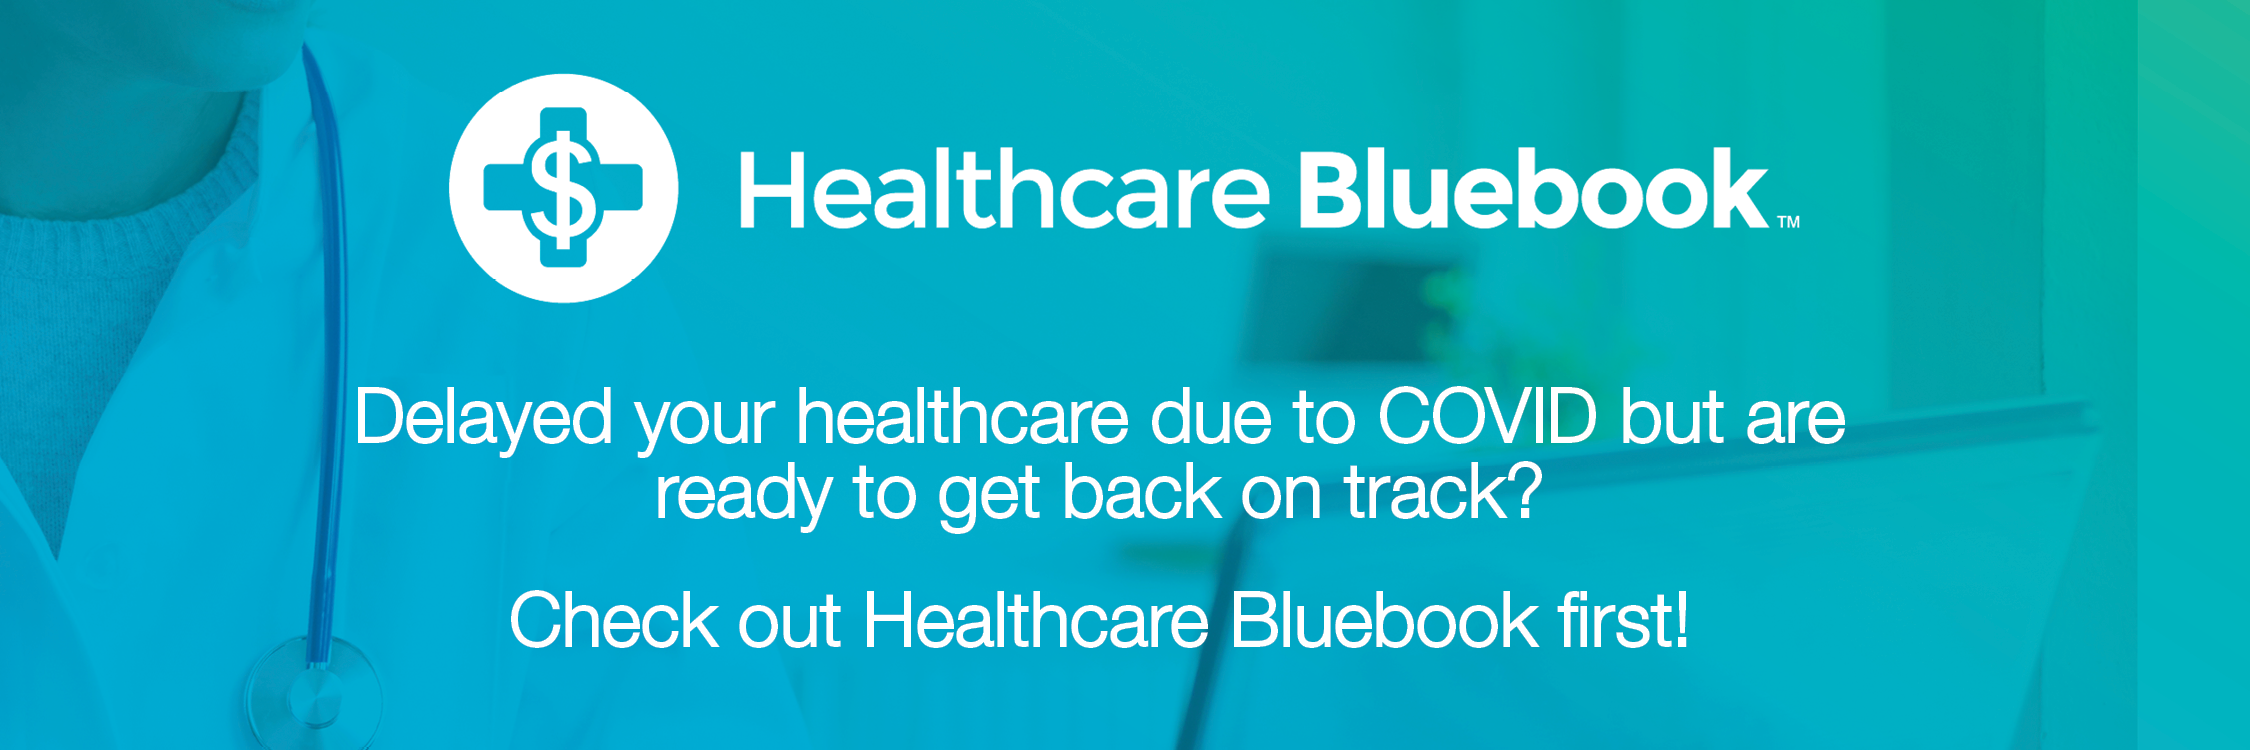 Image 2: Healthcare Bluebook